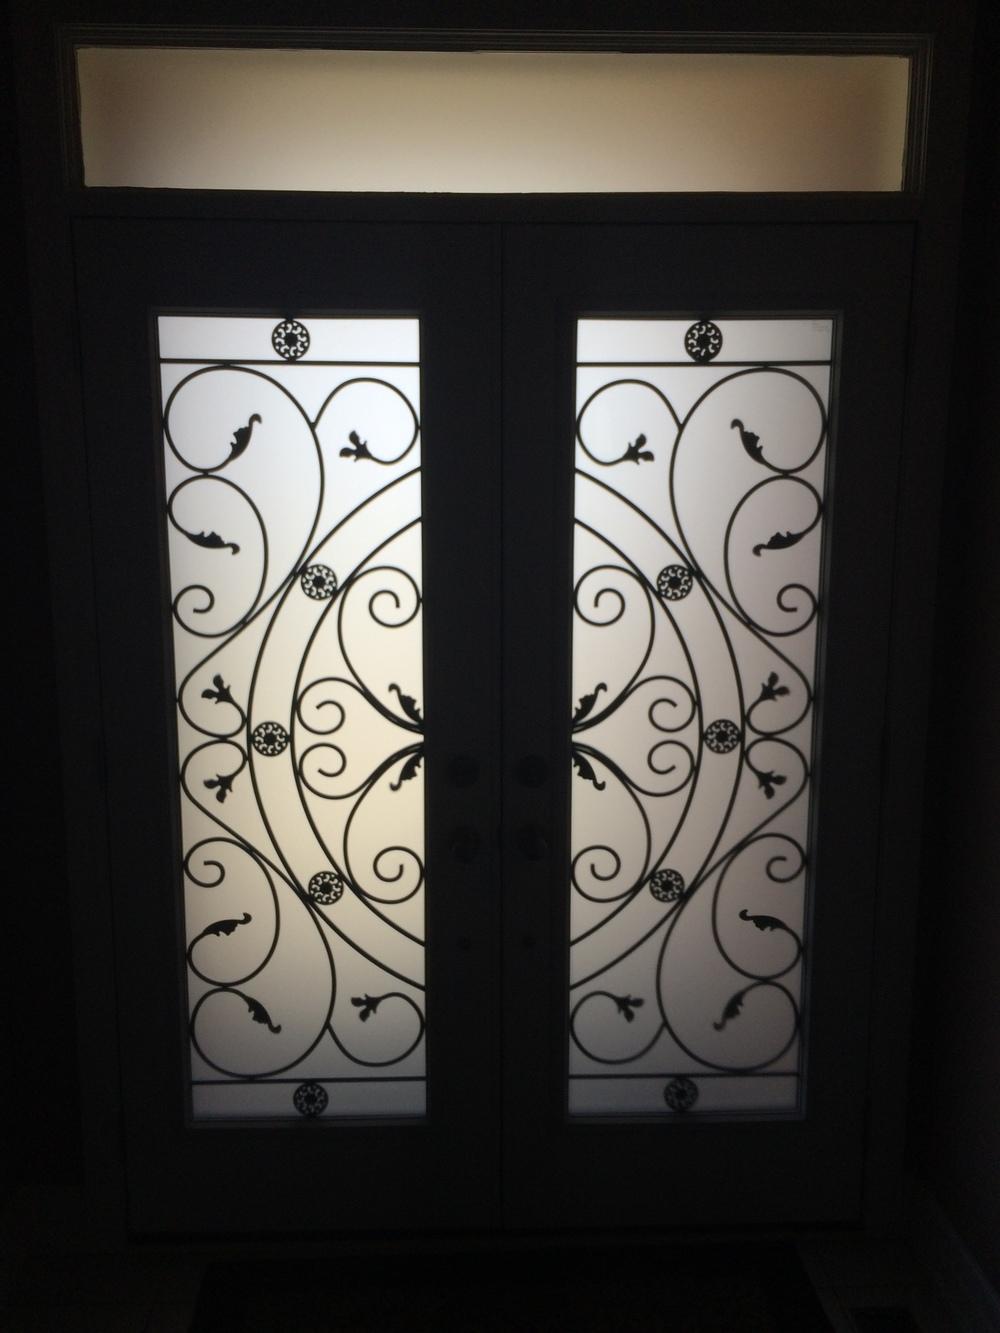 Campbellsford-Wrought-Iron-Glass-Door-Inserts-waterdown-Ontario